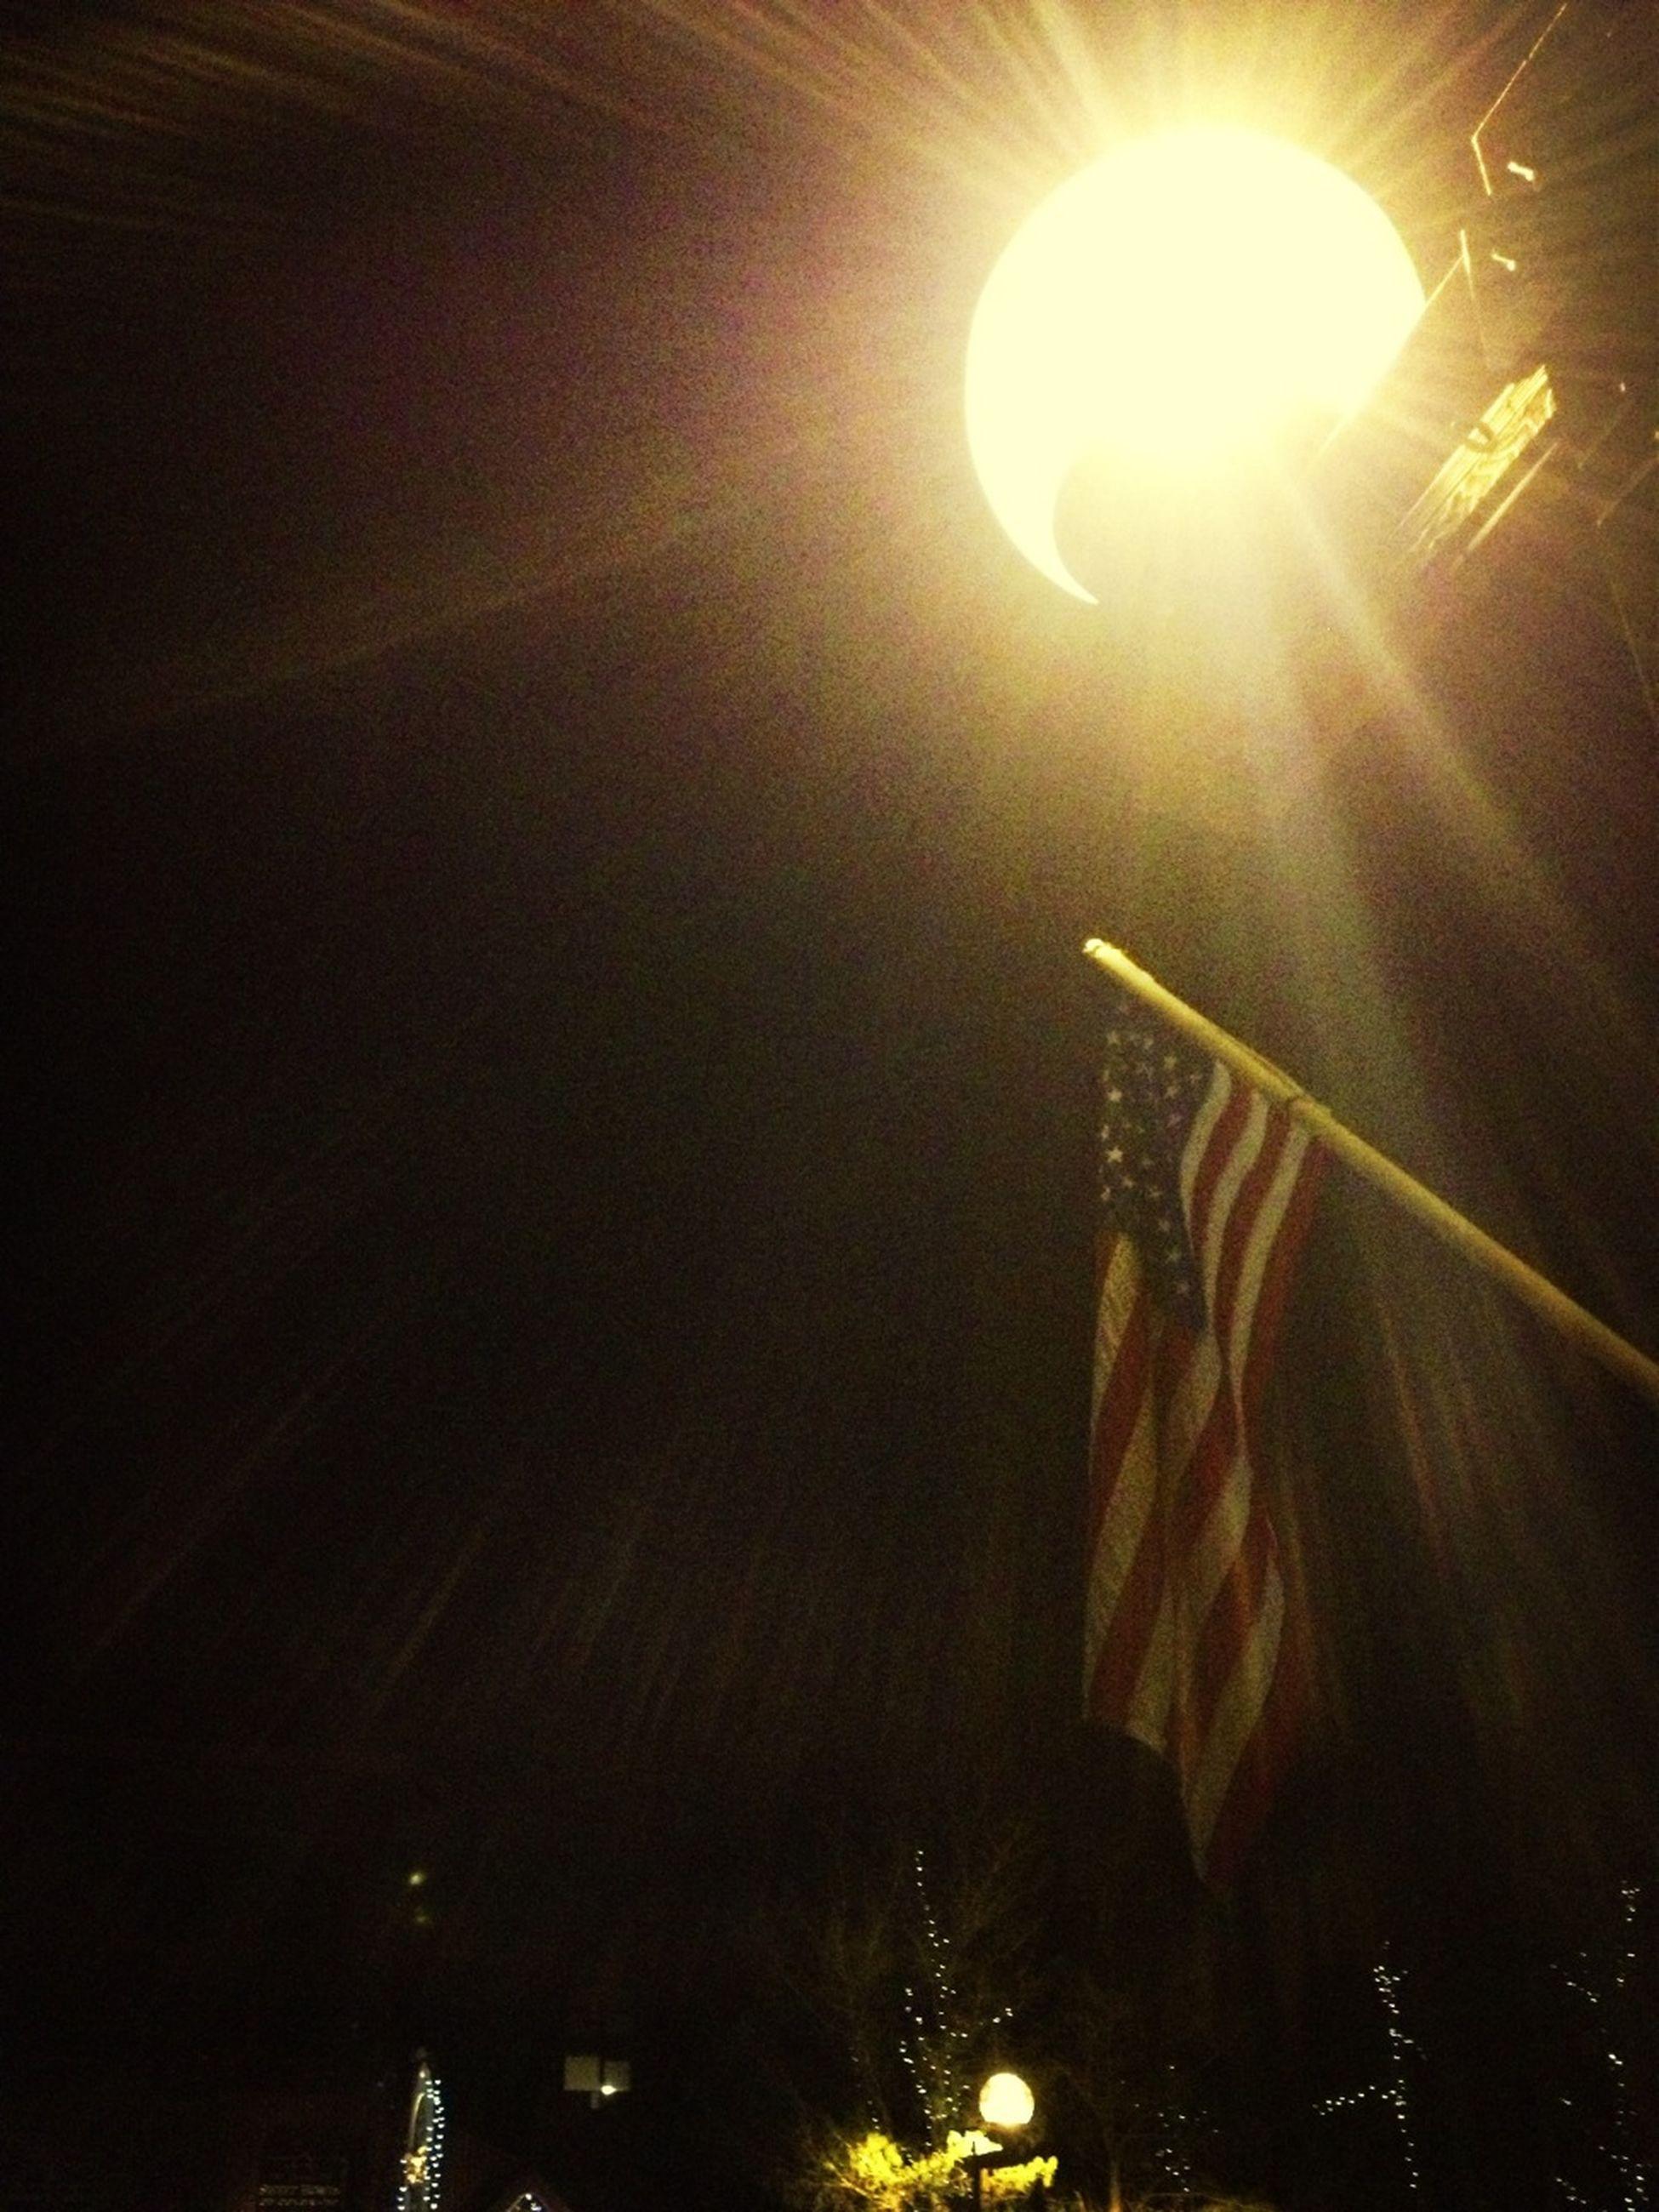 illuminated, low angle view, night, lens flare, lighting equipment, glowing, light - natural phenomenon, sun, sunbeam, no people, street light, sunlight, sky, bright, light beam, shiny, electricity, indoors, electric light